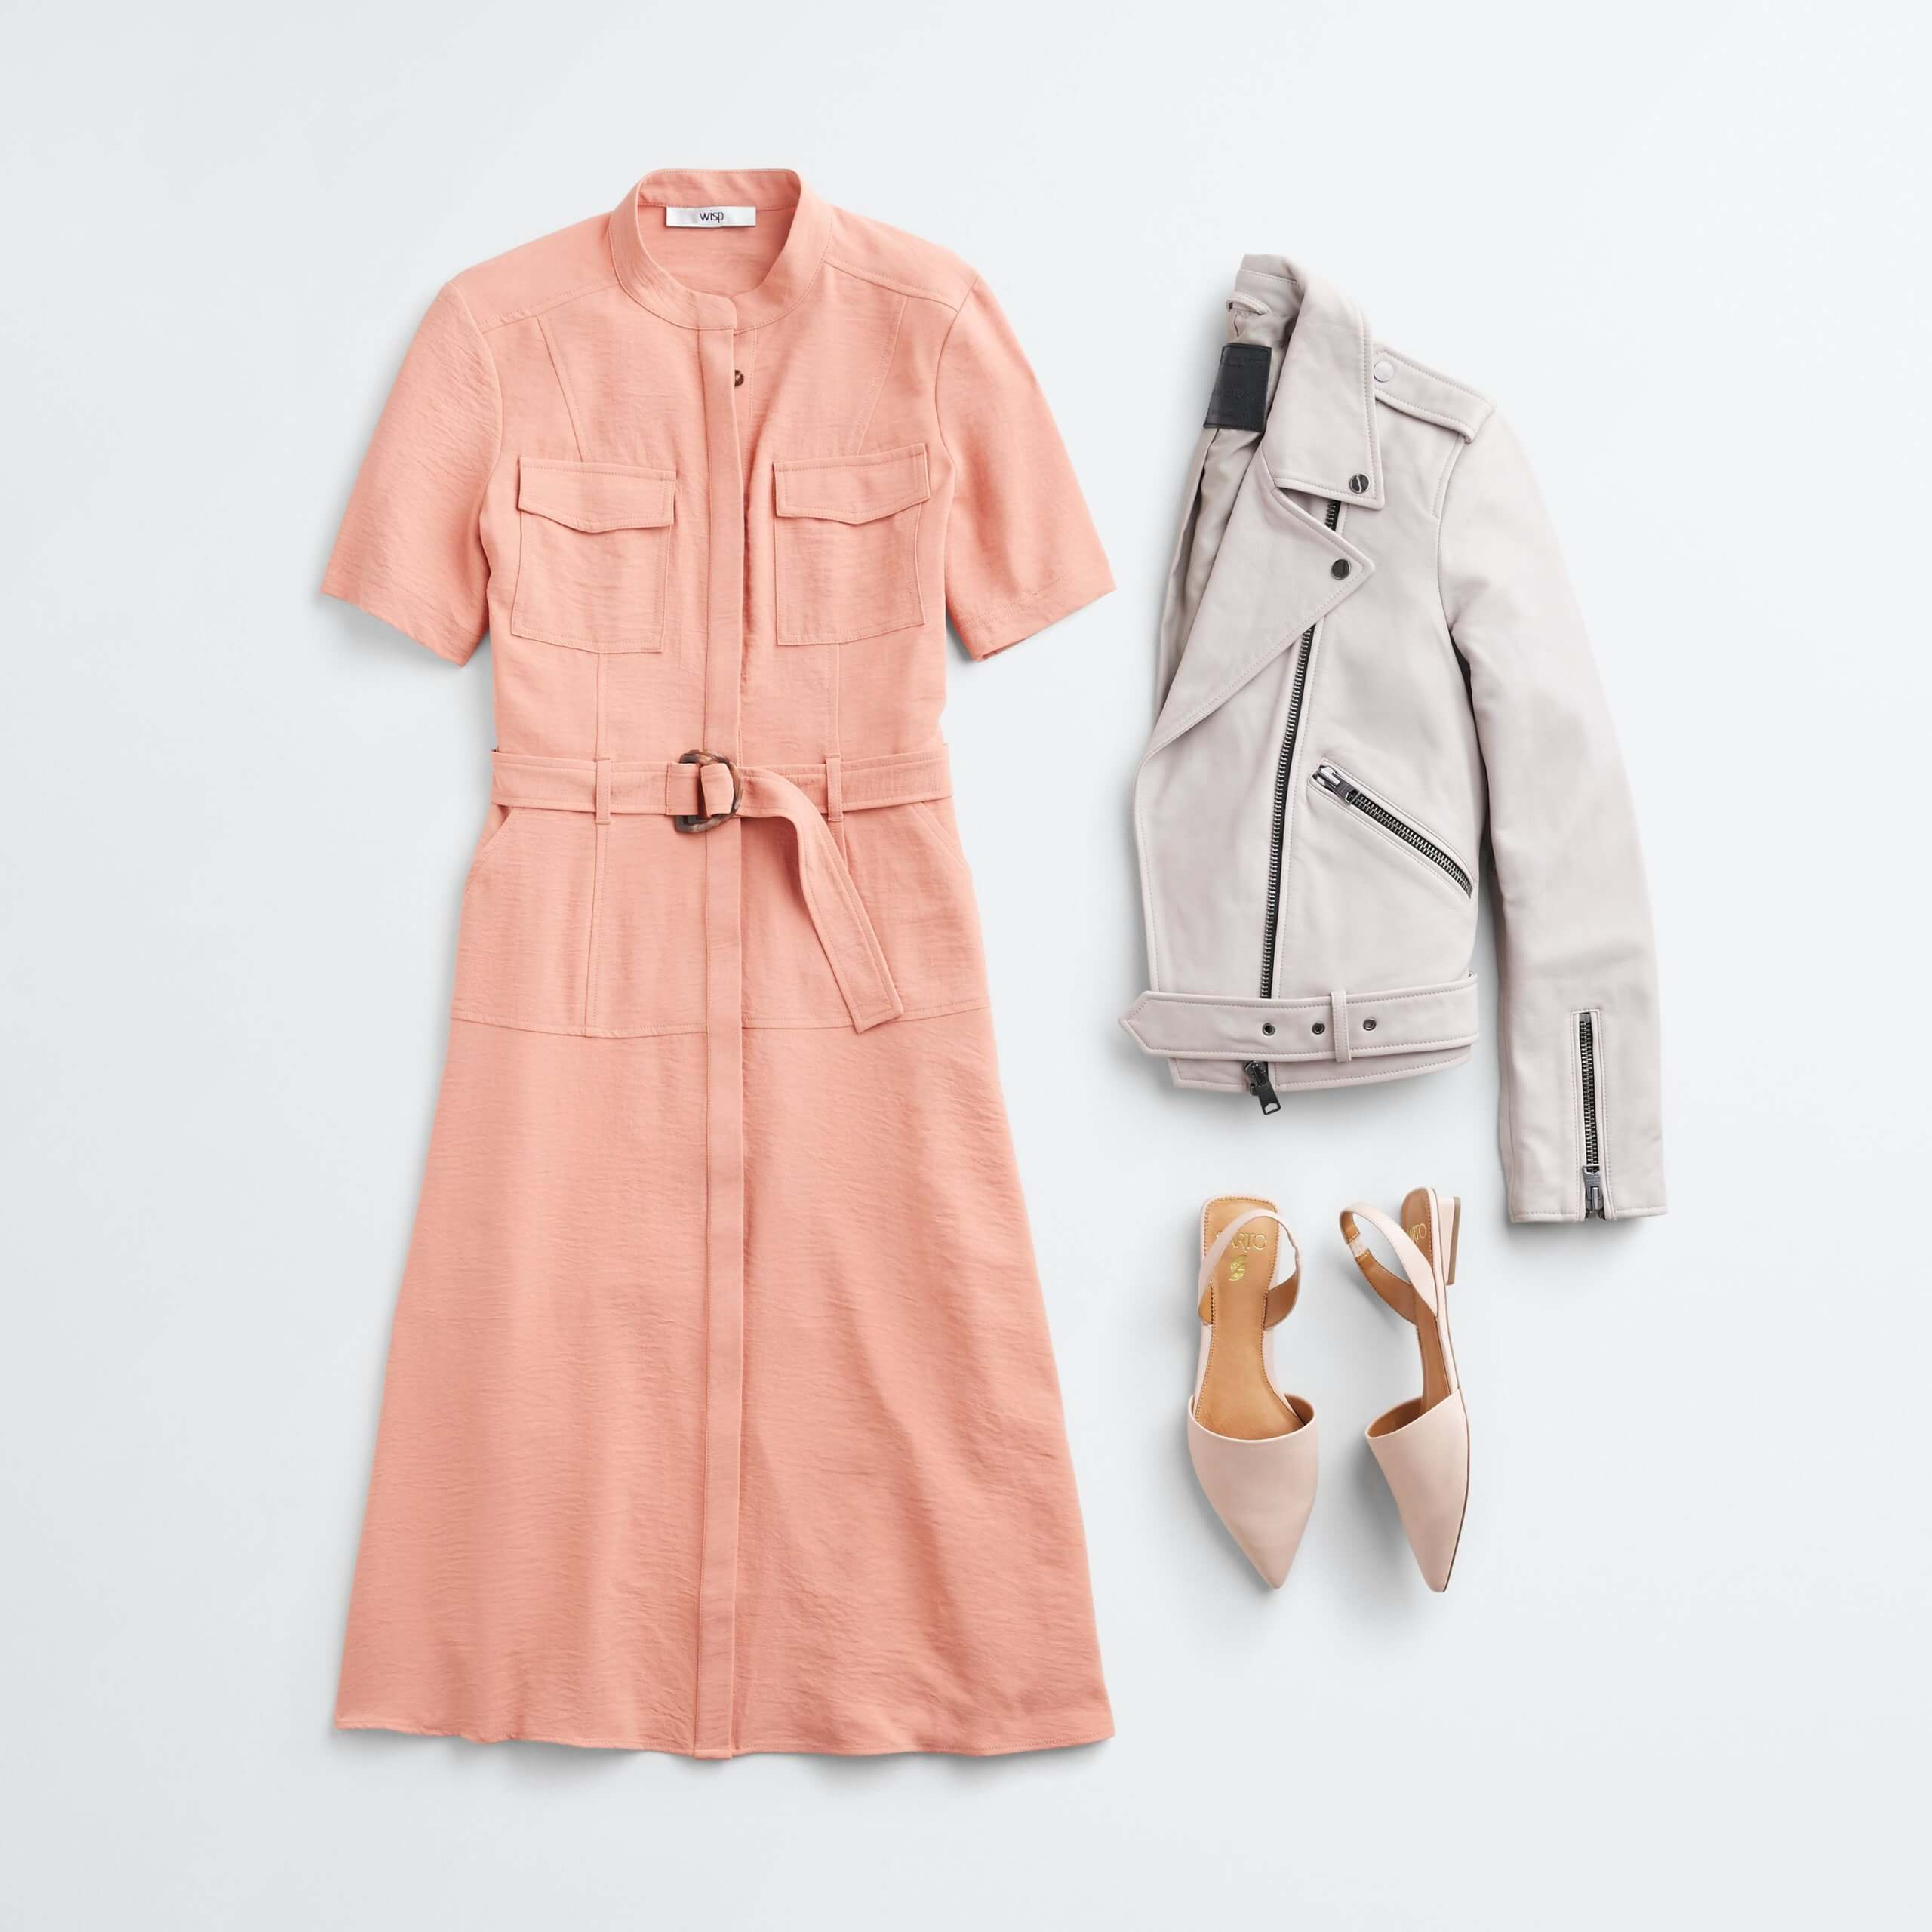 Stitch Fix Women's outfit laydown featuring pink tie-waist shirt dress, beige leather biker jacket and beige flats.